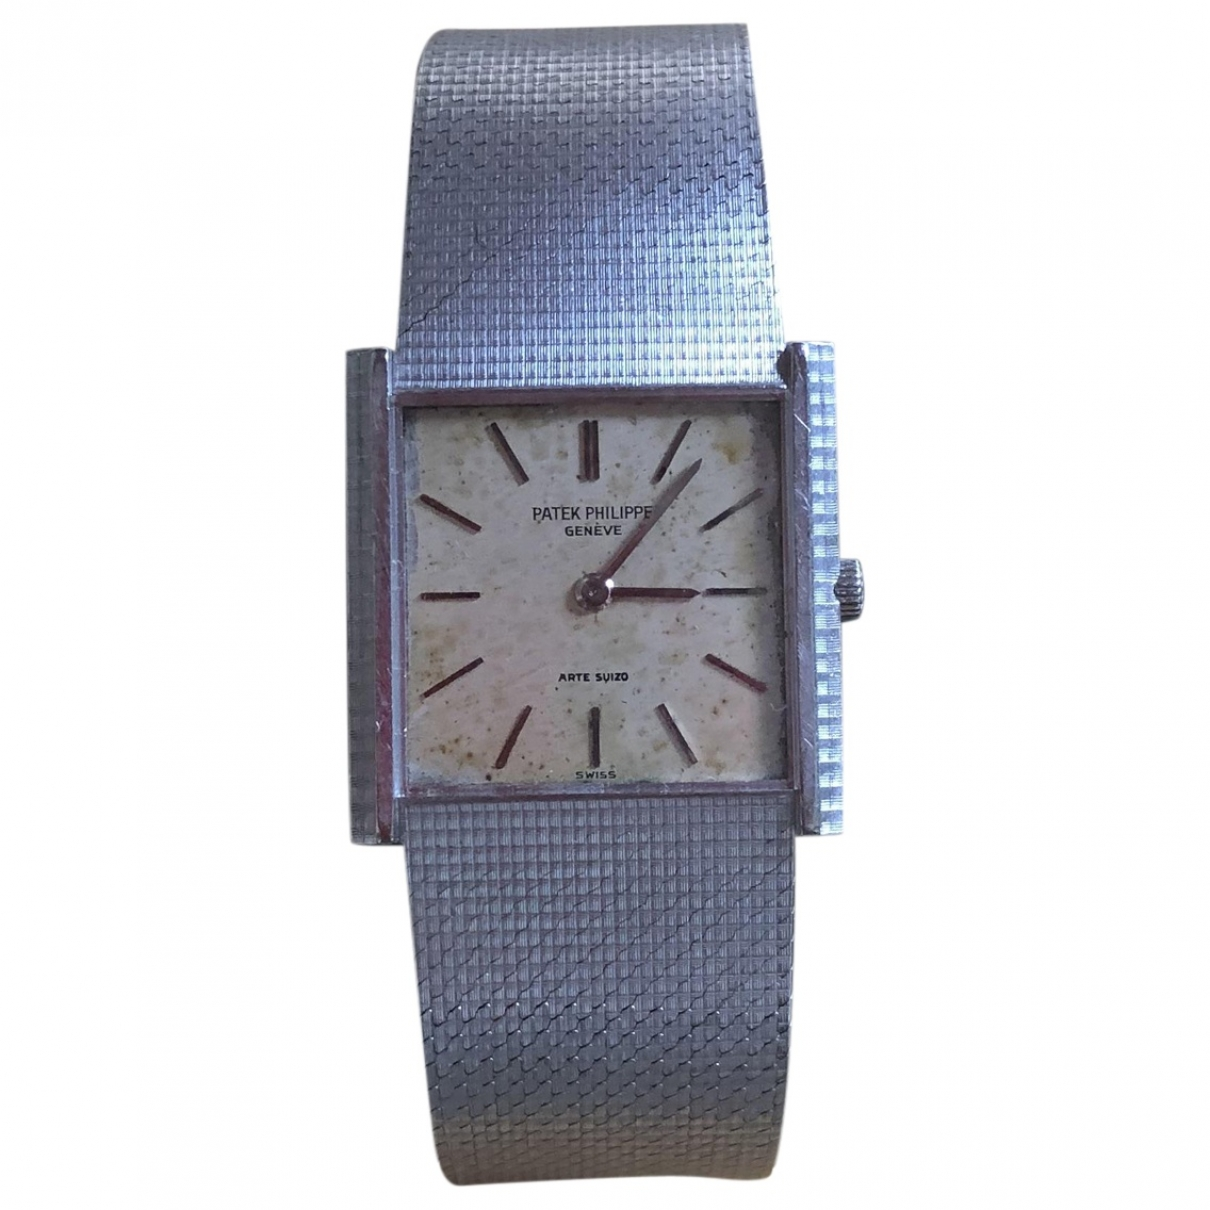 Patek Philippe \N Grey White gold watch for Men \N